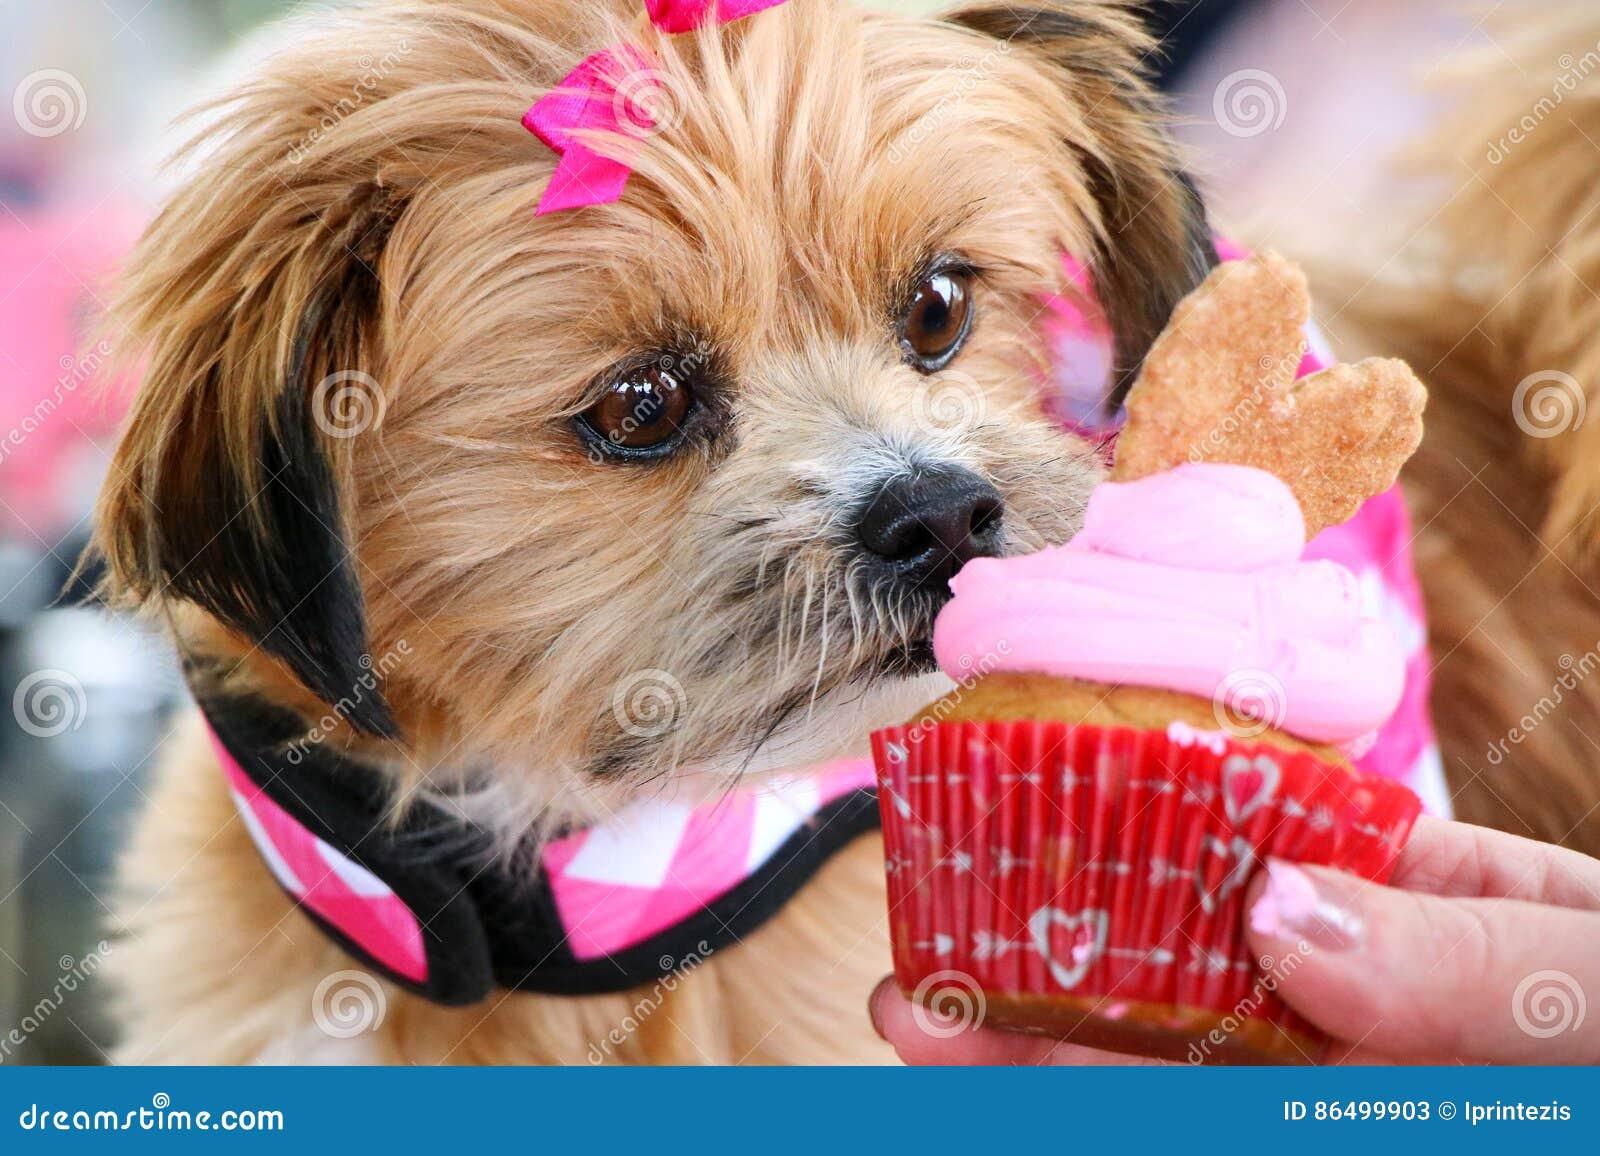 Cute Dog Eating Birthday Cupcake Stock Photo Image 86499903